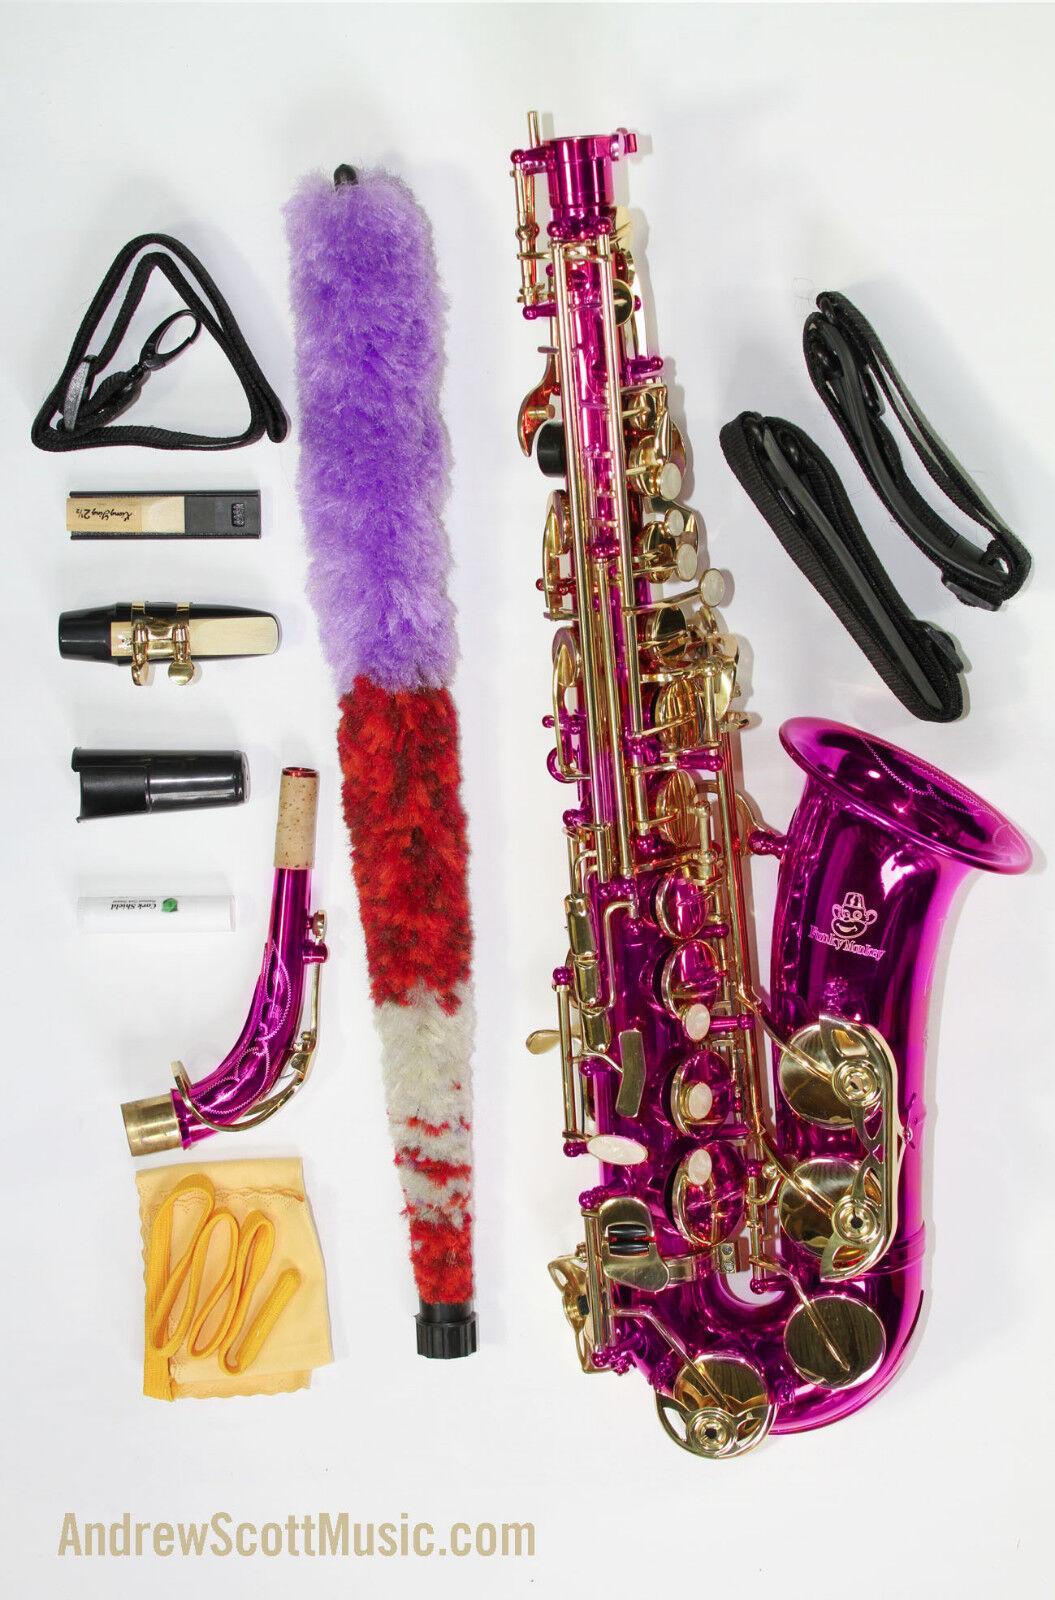 Nuevo Saxofón Alto en caso rosadodo caliente-OBRA MAESTRA MAESTRA MAESTRA 3a1865